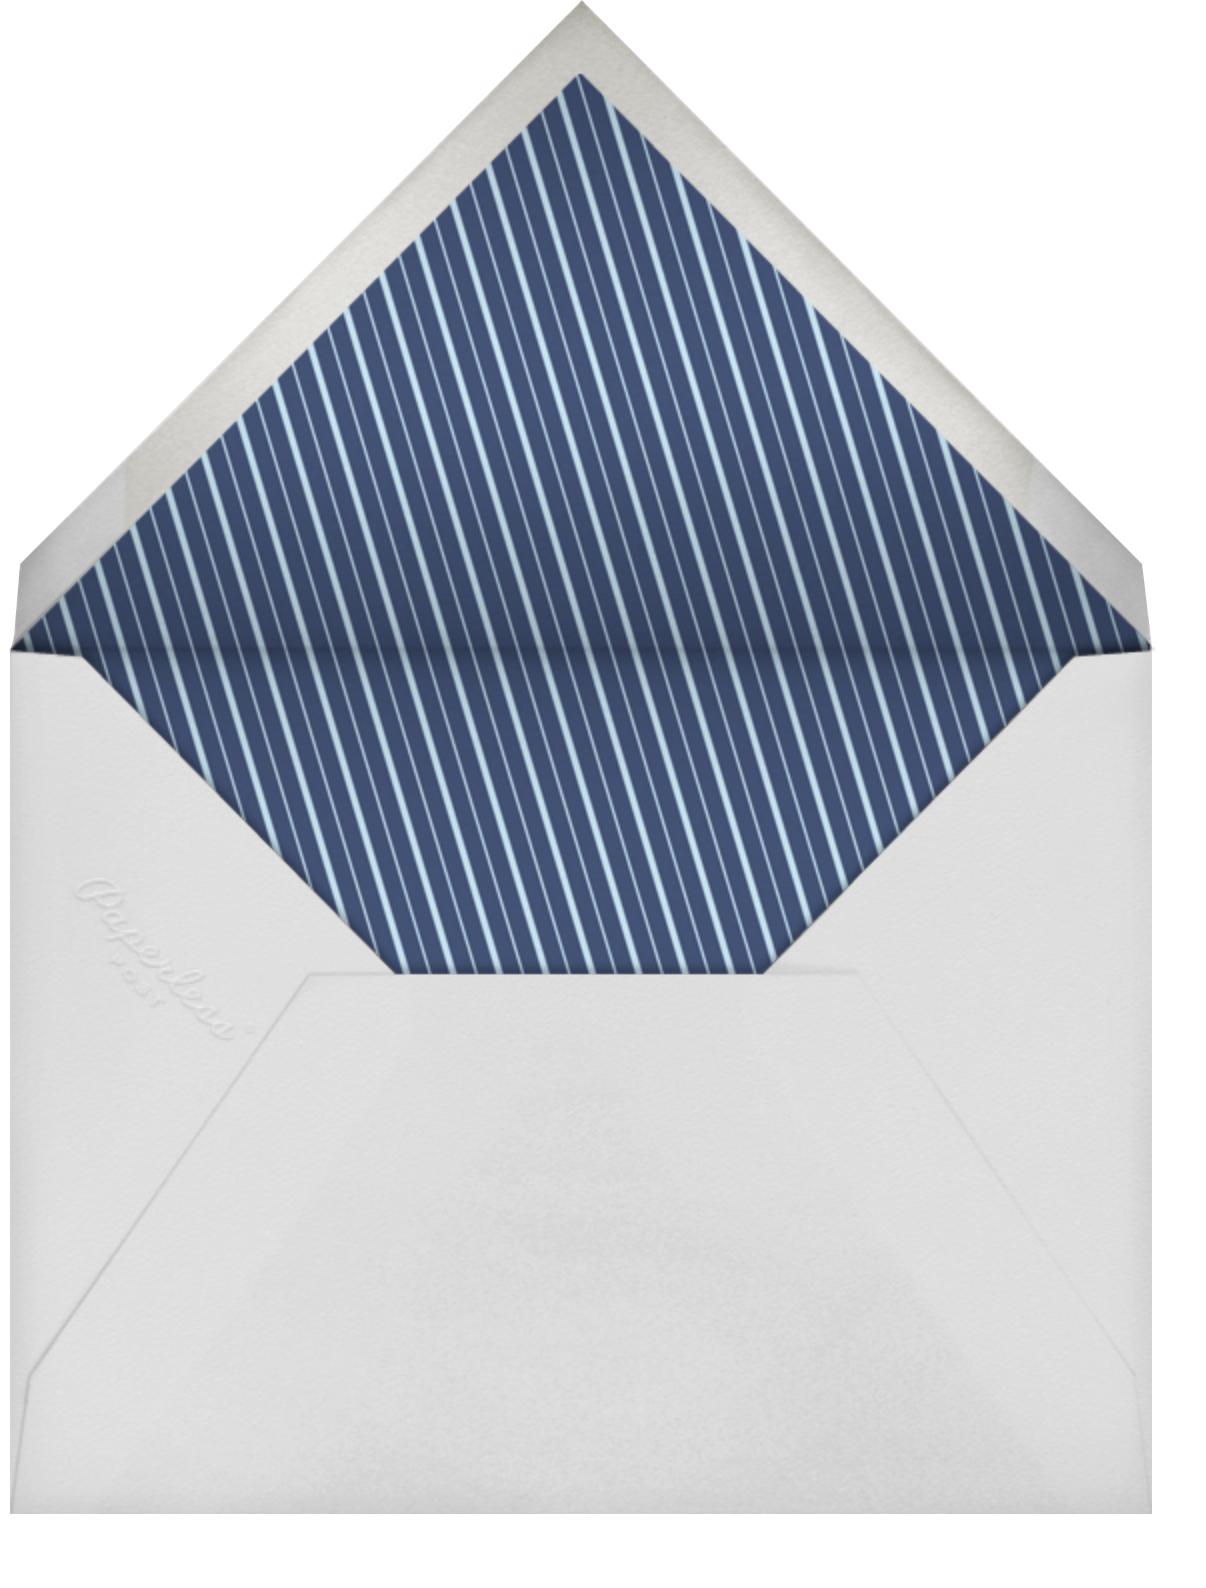 Title Card - Pacific - Paperless Post - Hanukkah - envelope back